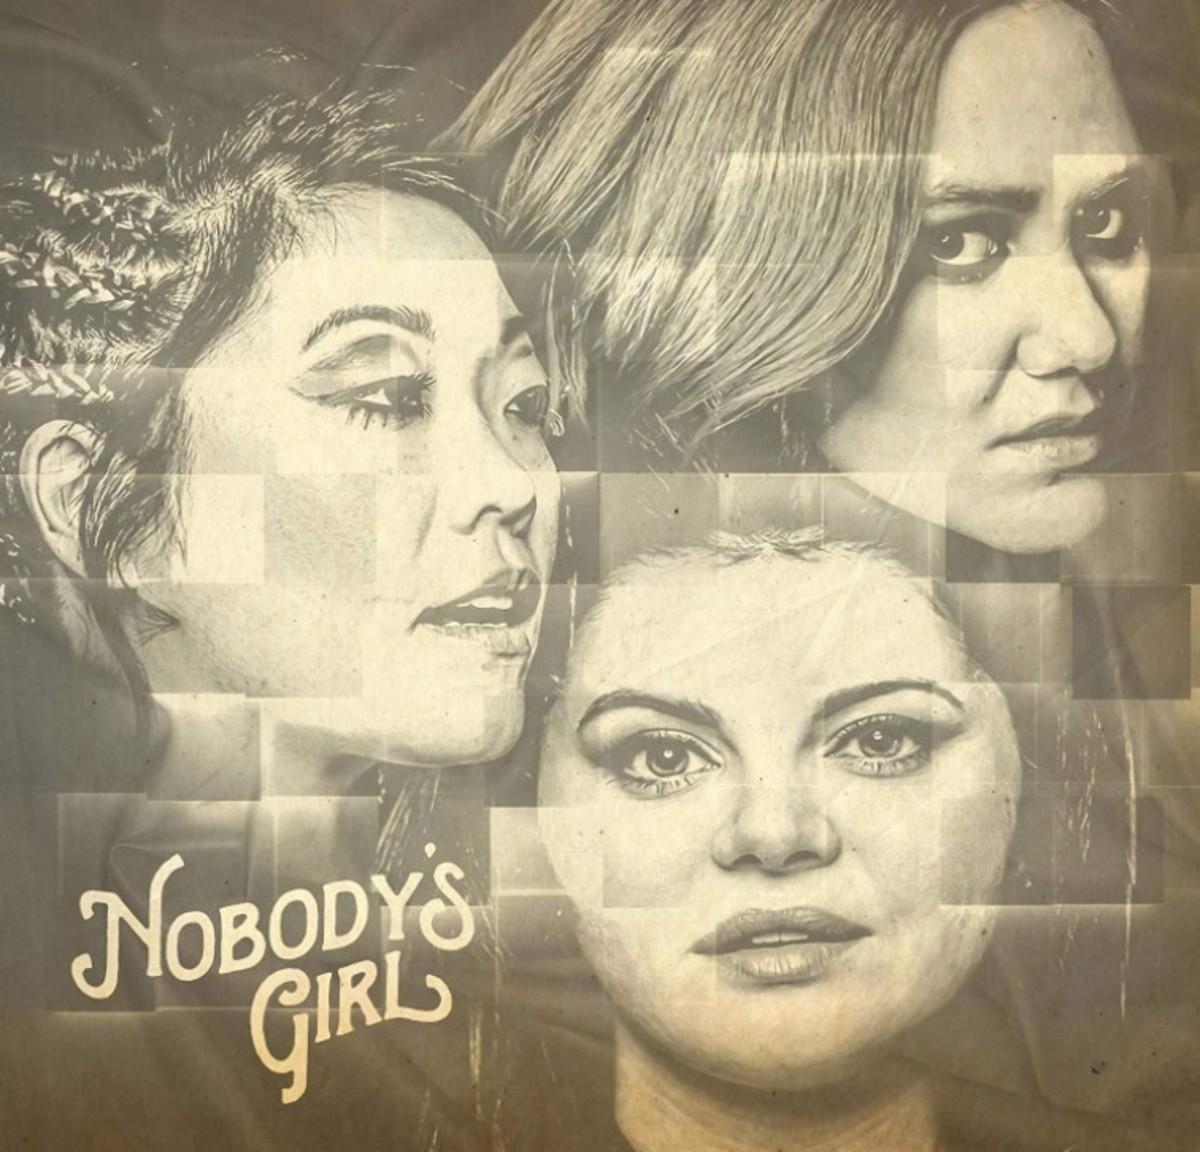 Nobodys album